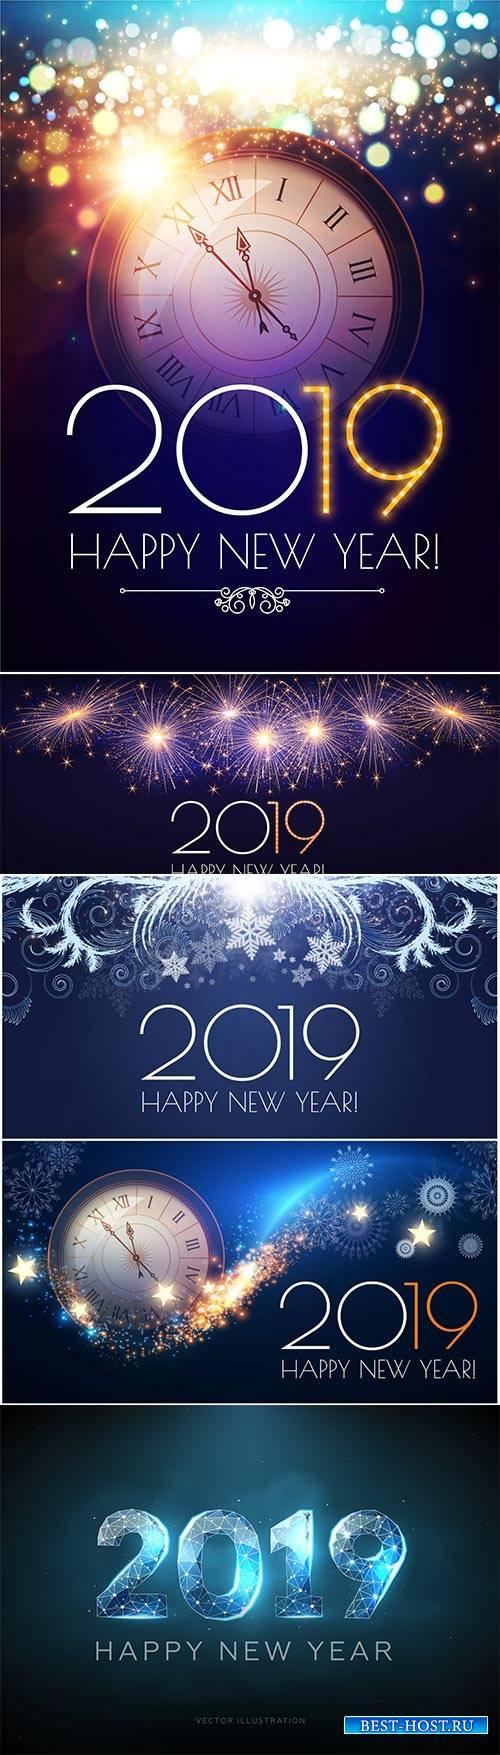 Happy New 2019 Year vector illustration, clock, fireworks